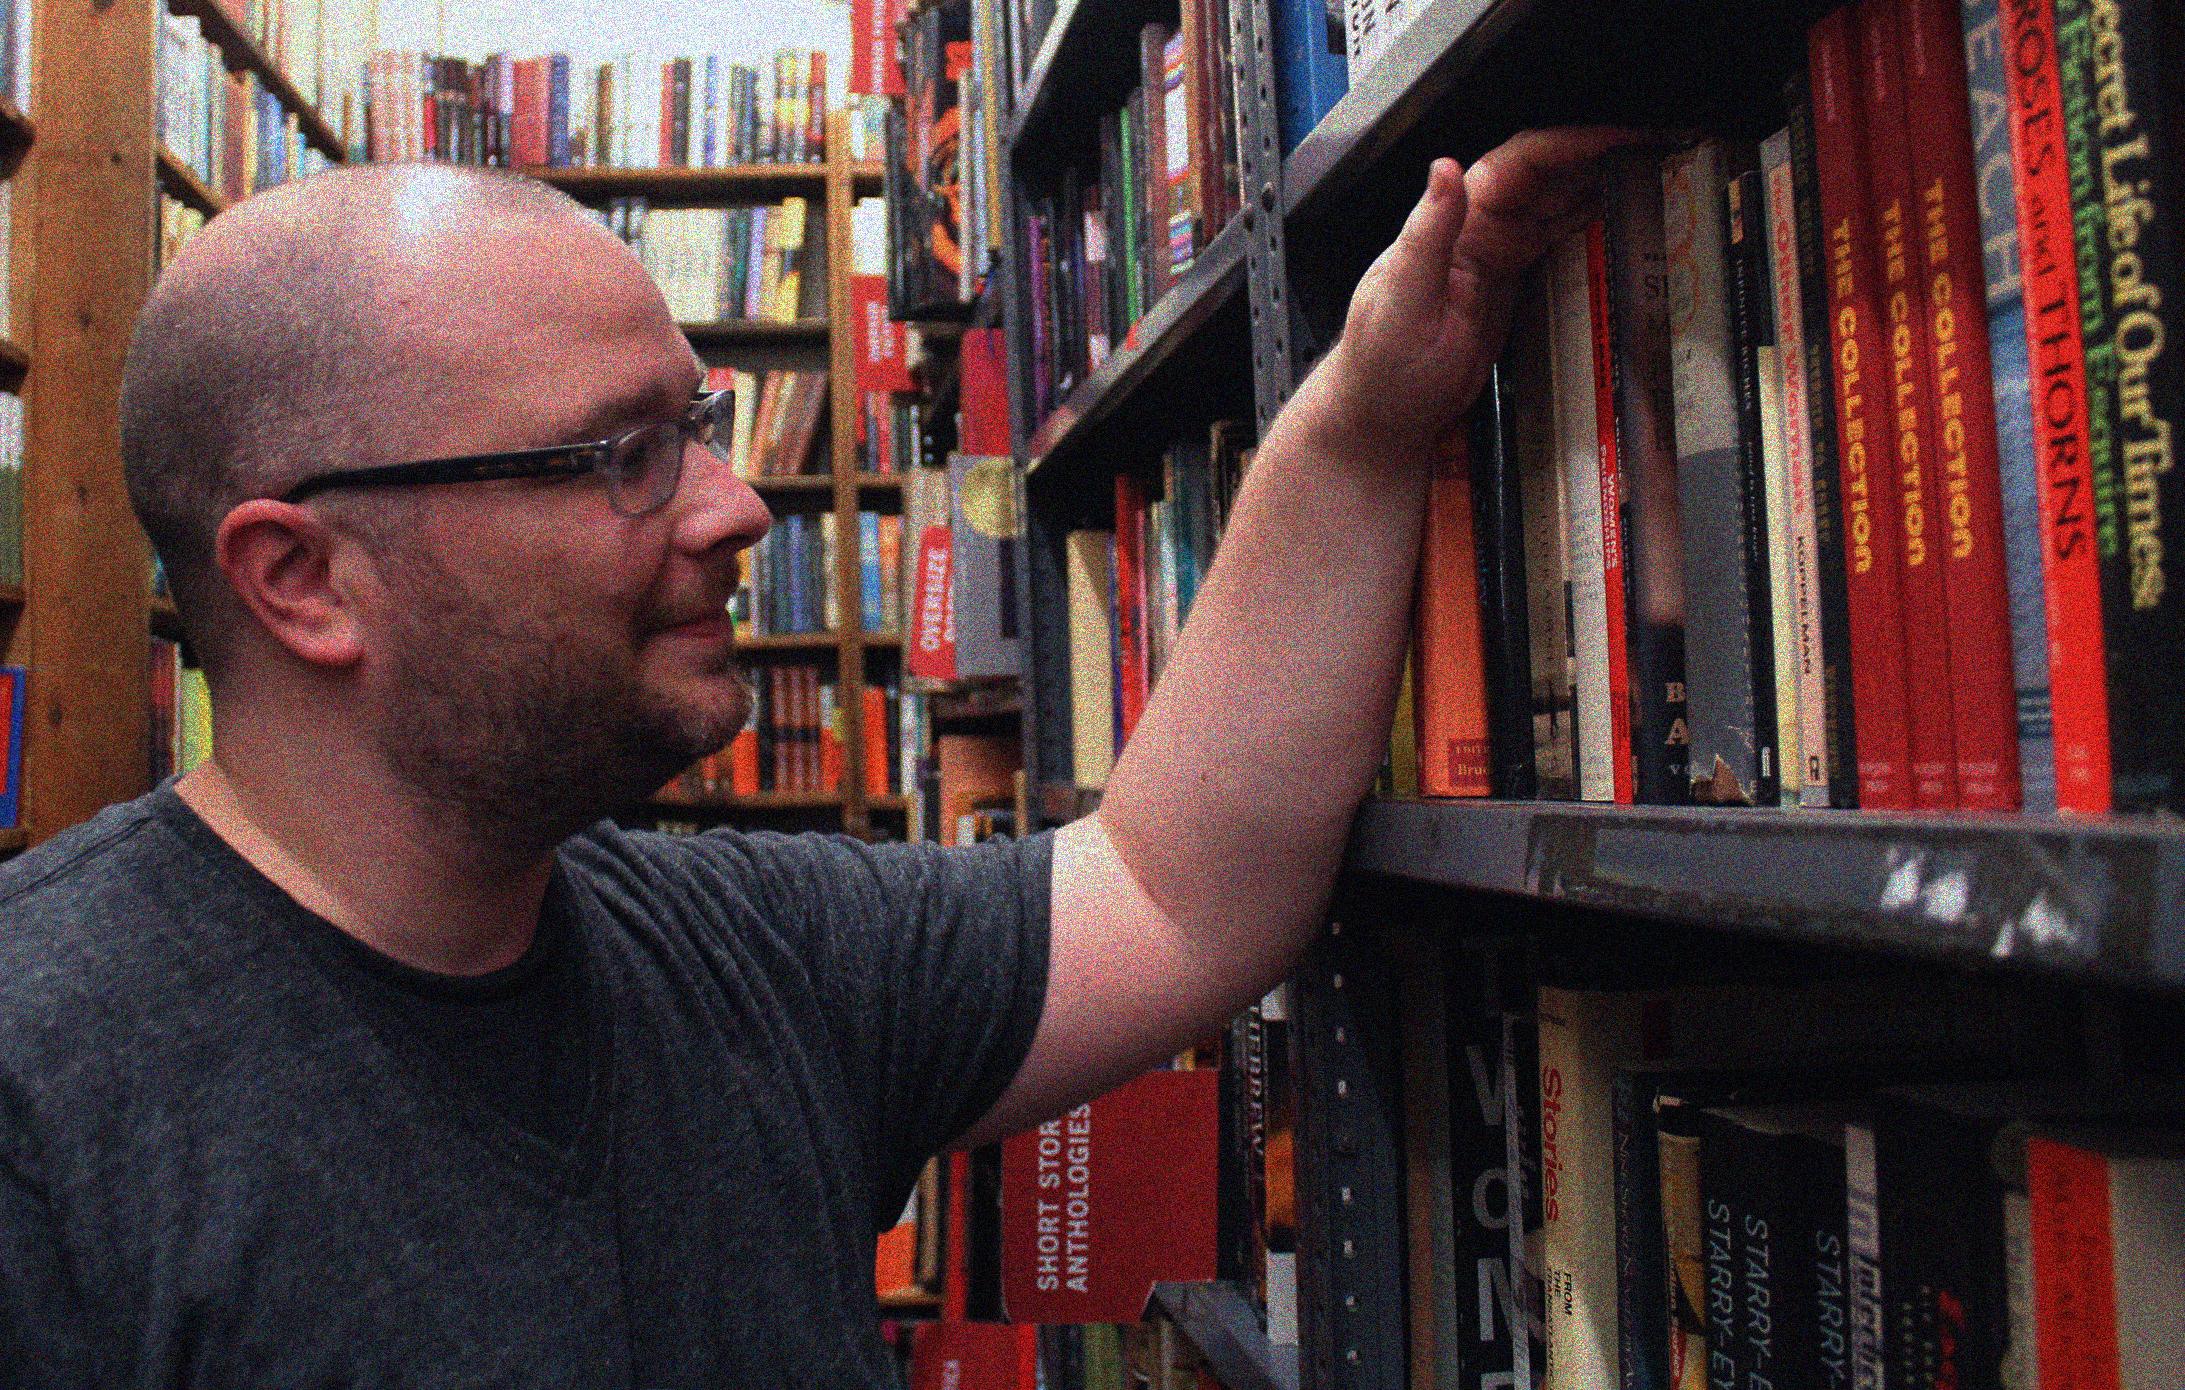 Fredrick-side bookstore